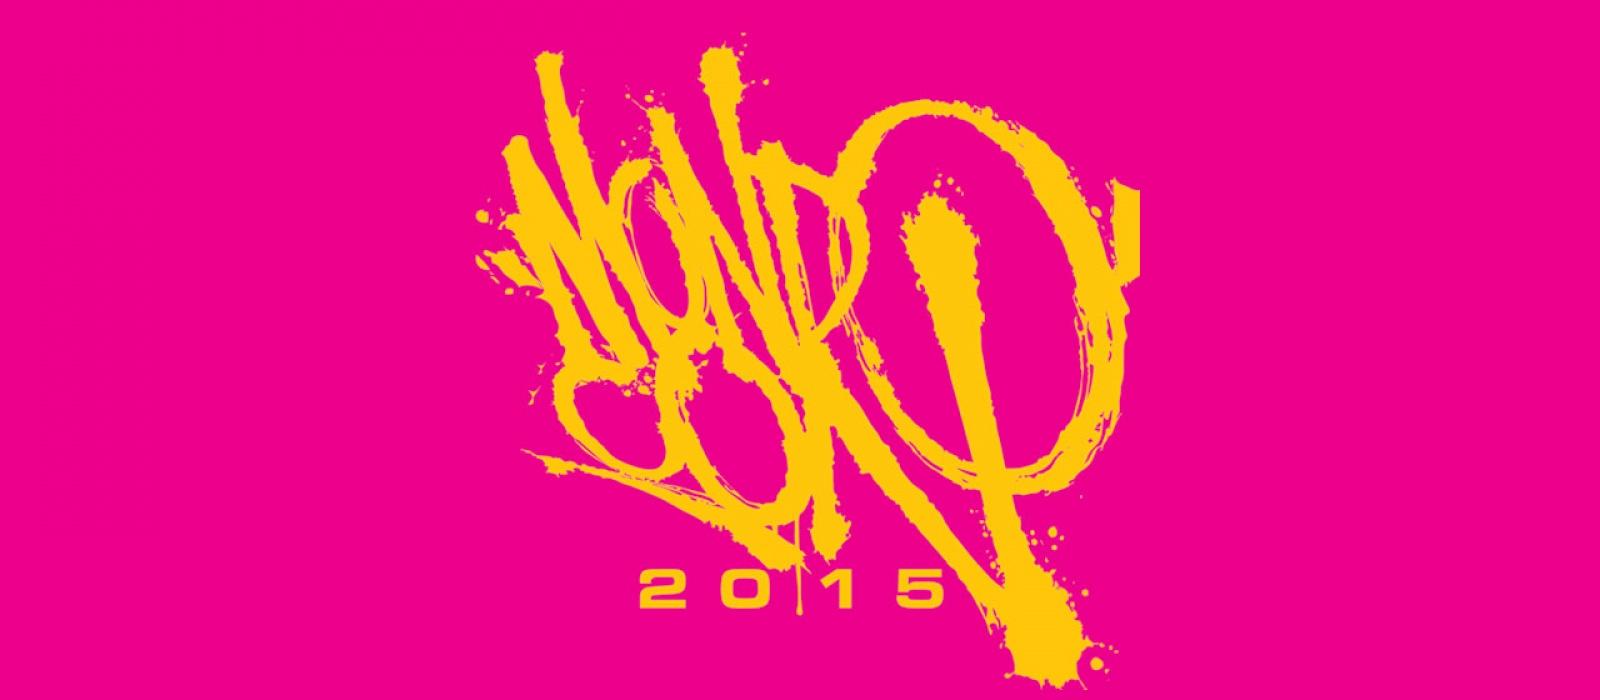 Mondo-Con 2015 Second Wave Announcement Blog